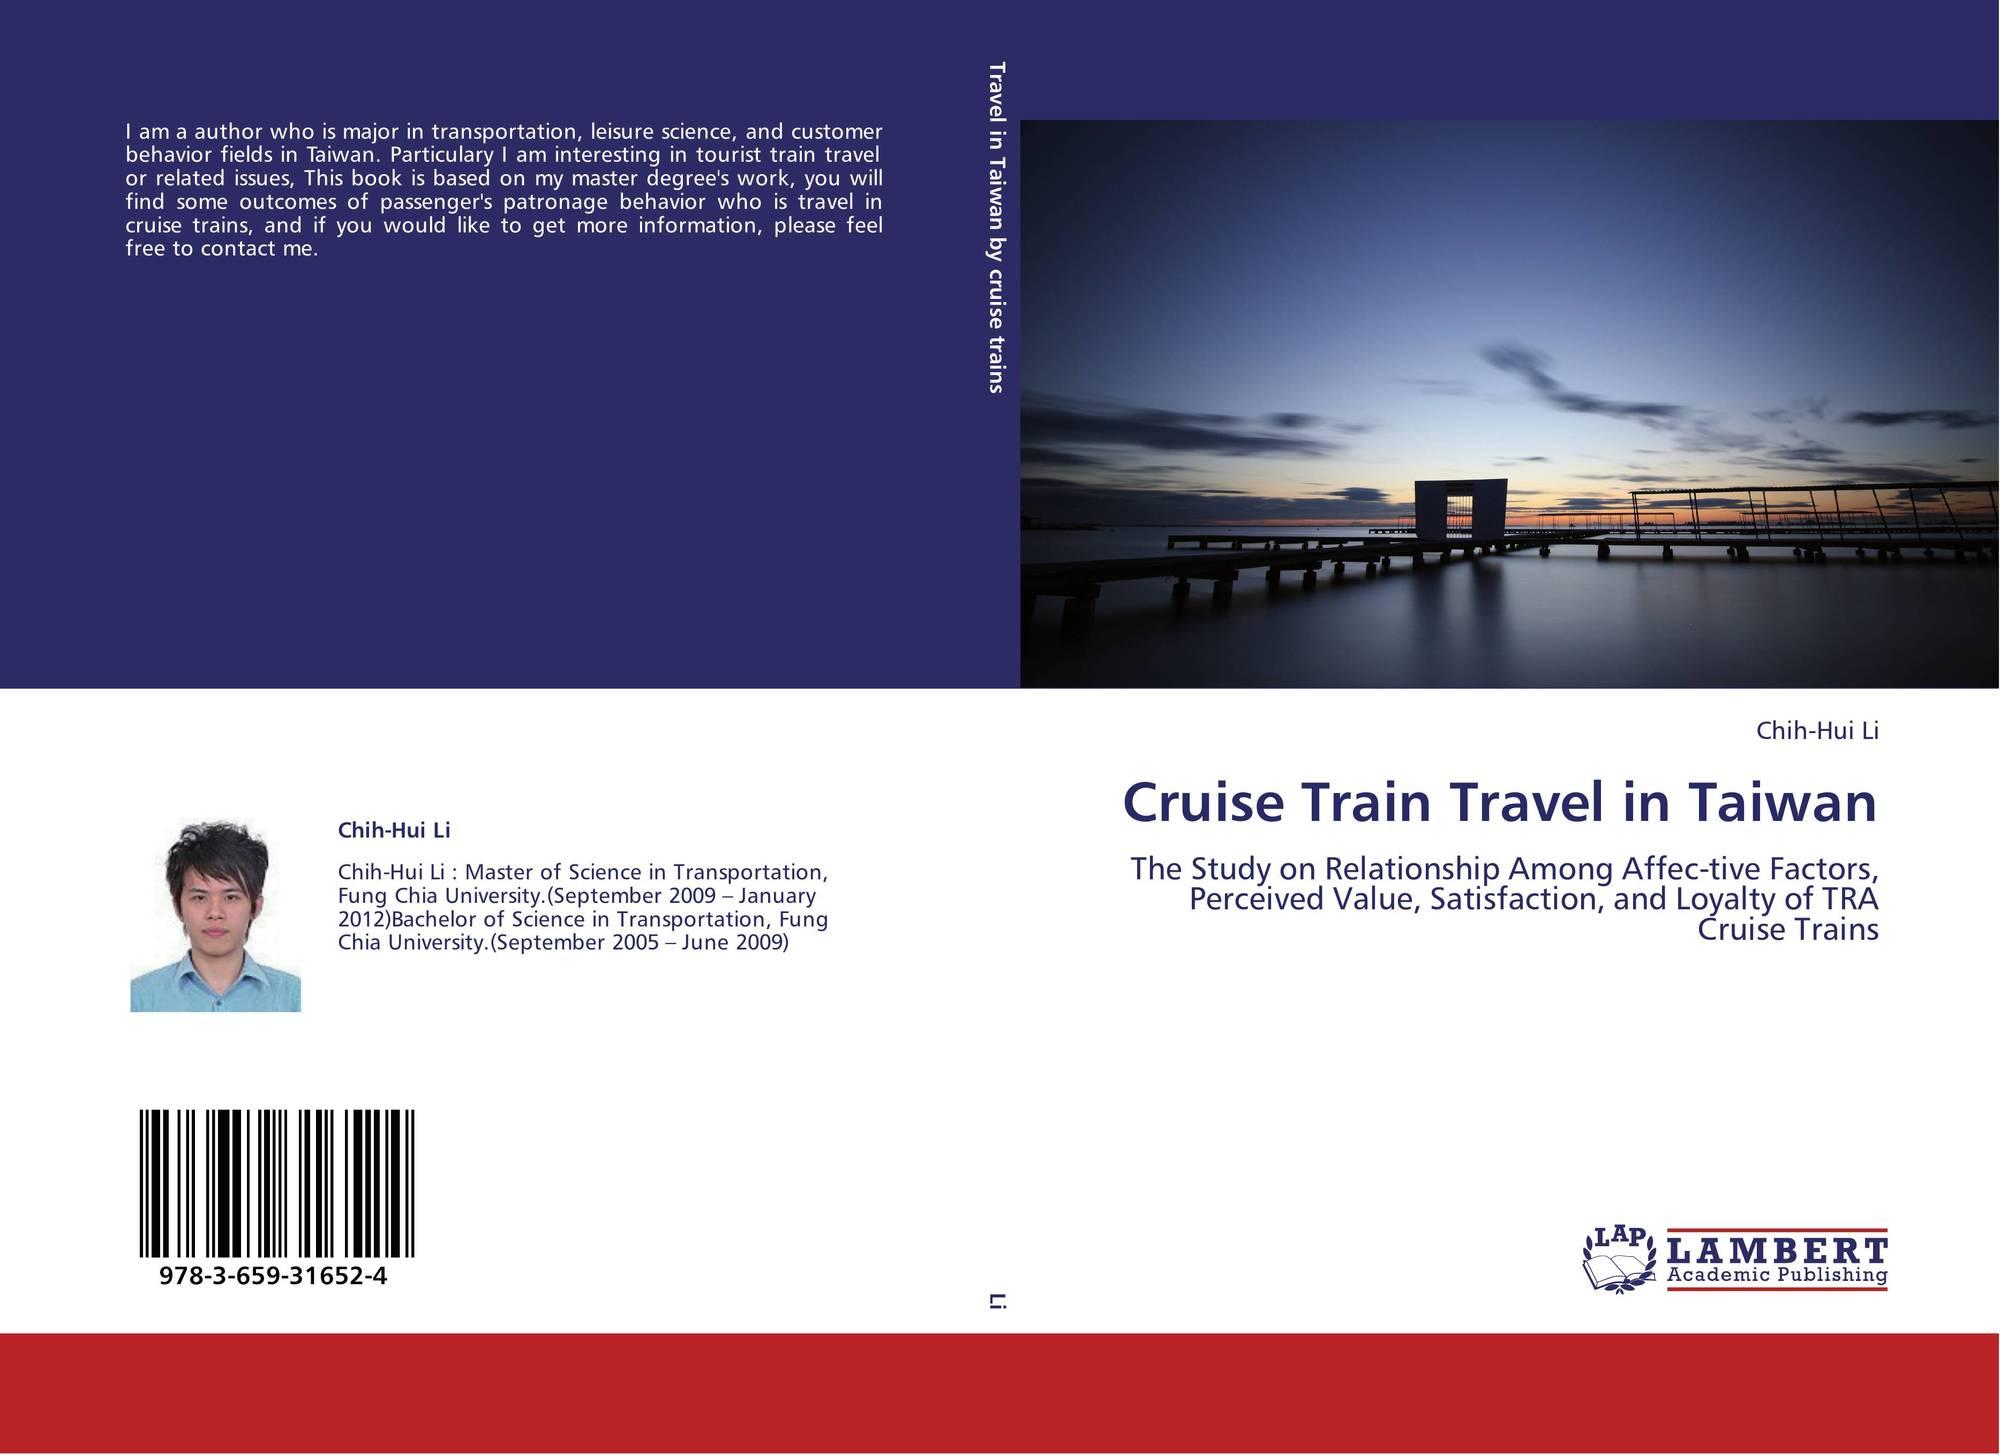 Cruise Train Travel in Taiwan, 978-3-659-31652-4, 3659316520